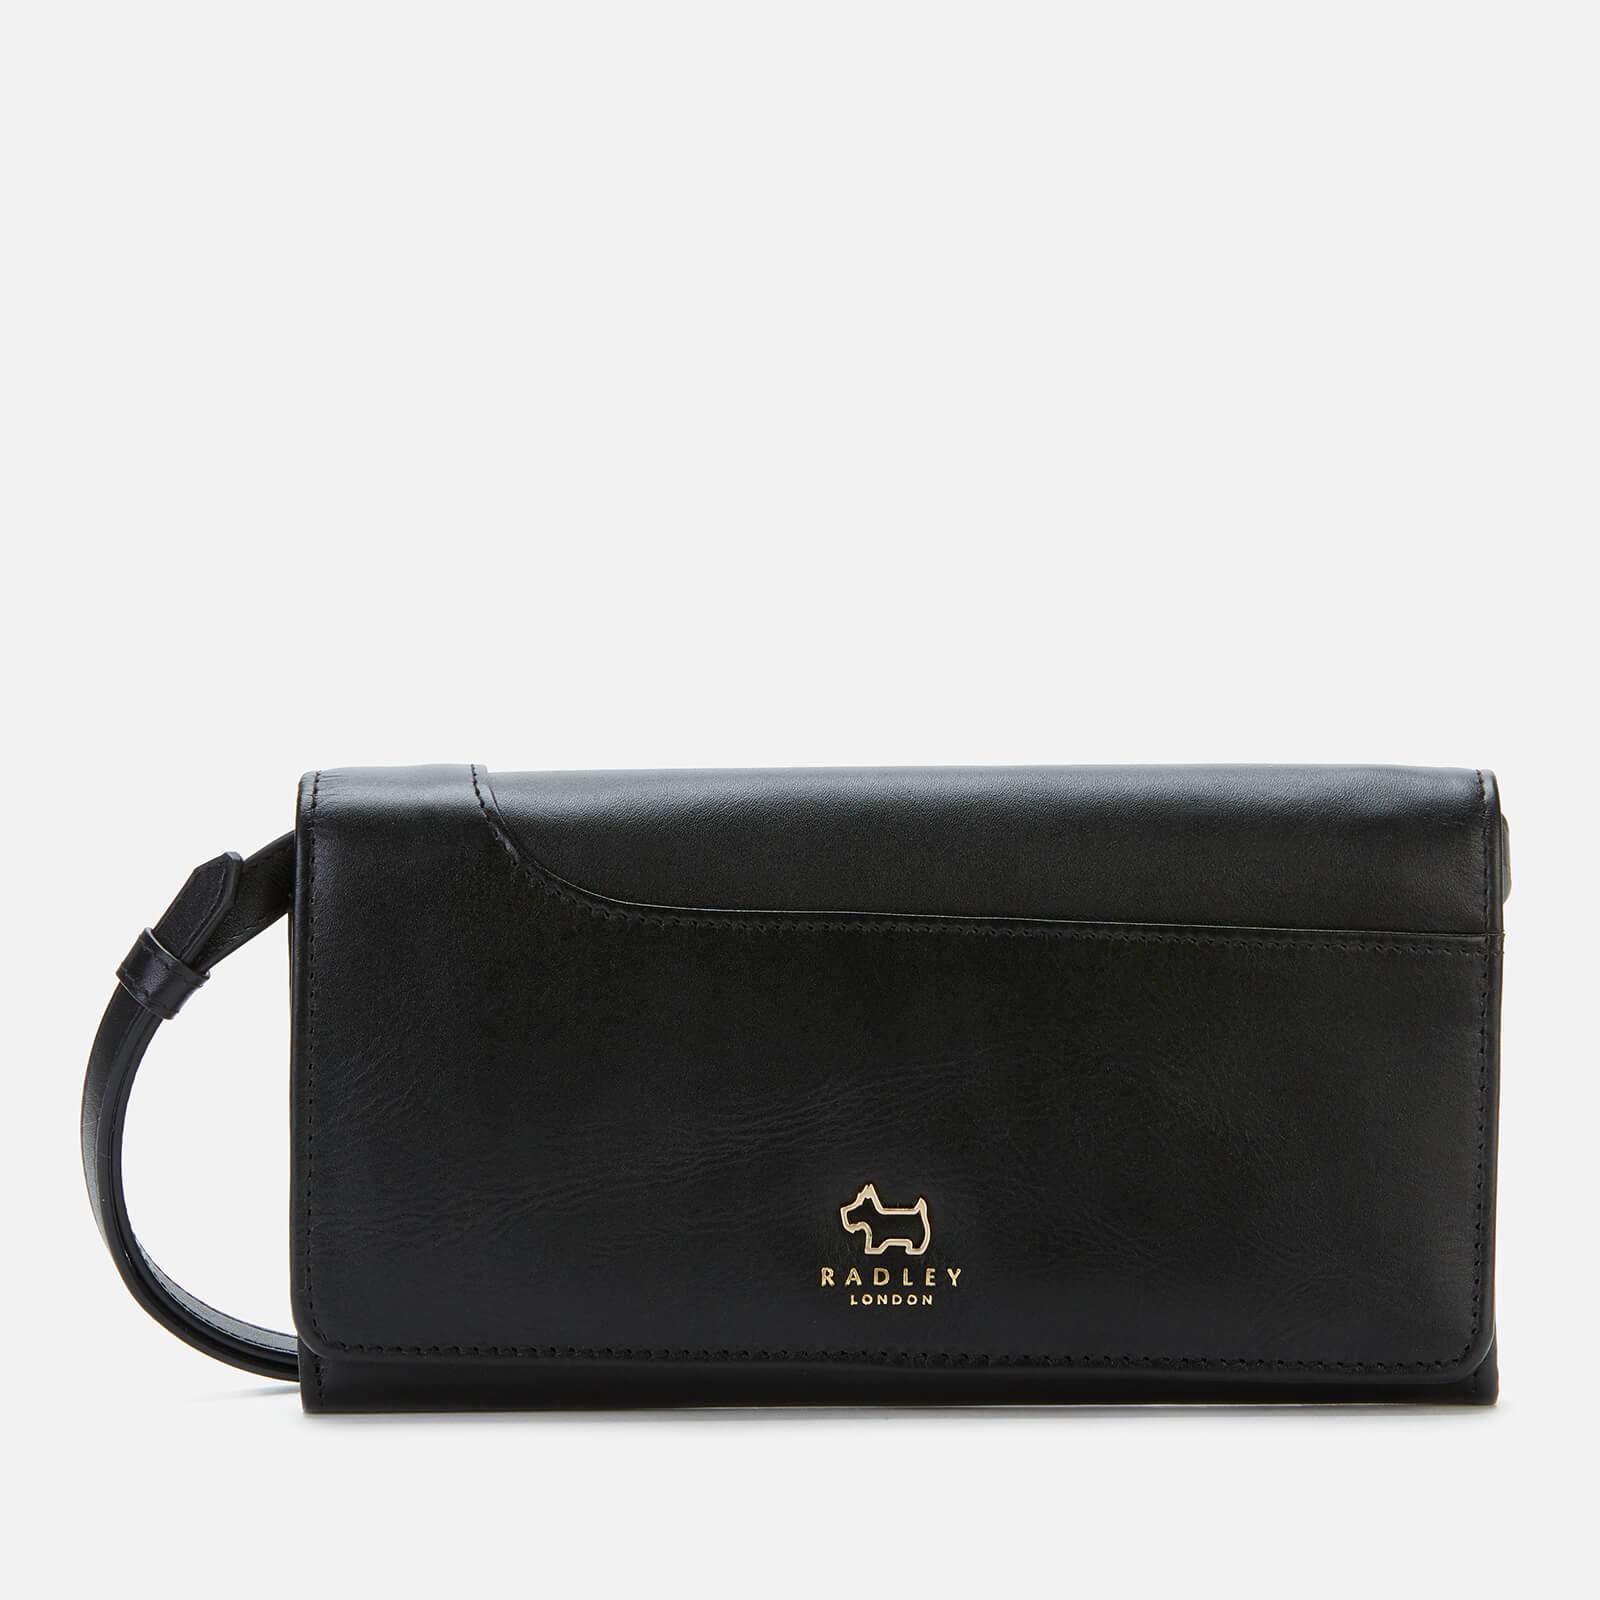 Radley Women's Pockets Large Phone Cross Body Bag - Black